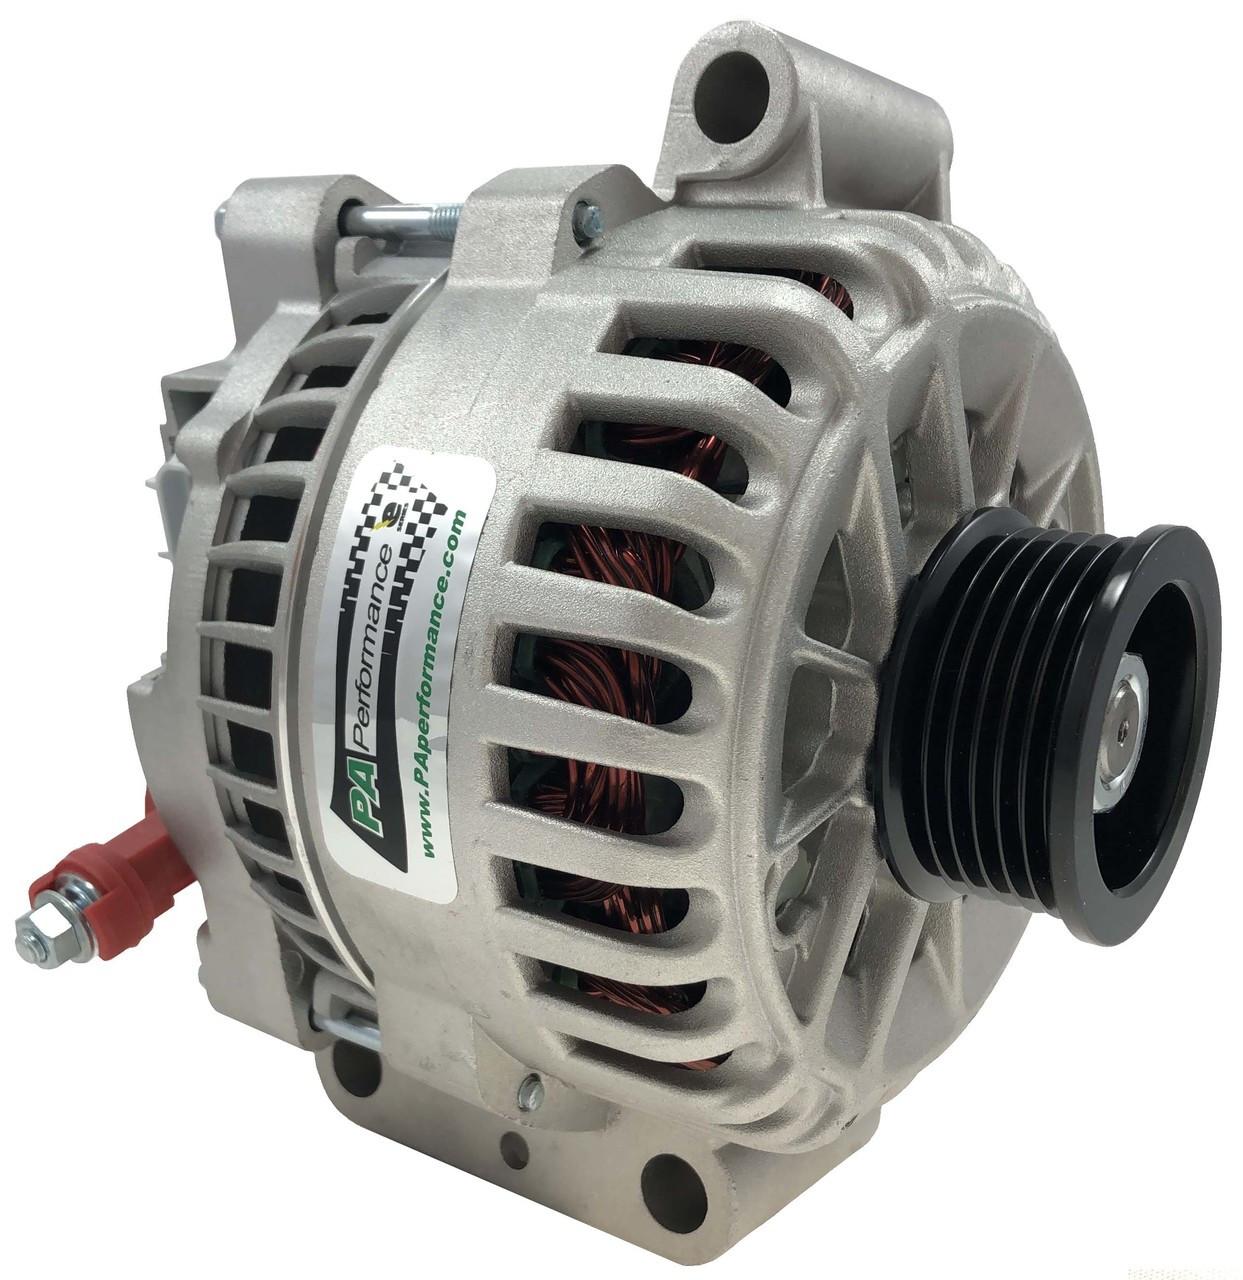 130A 6G Alternator (2438)